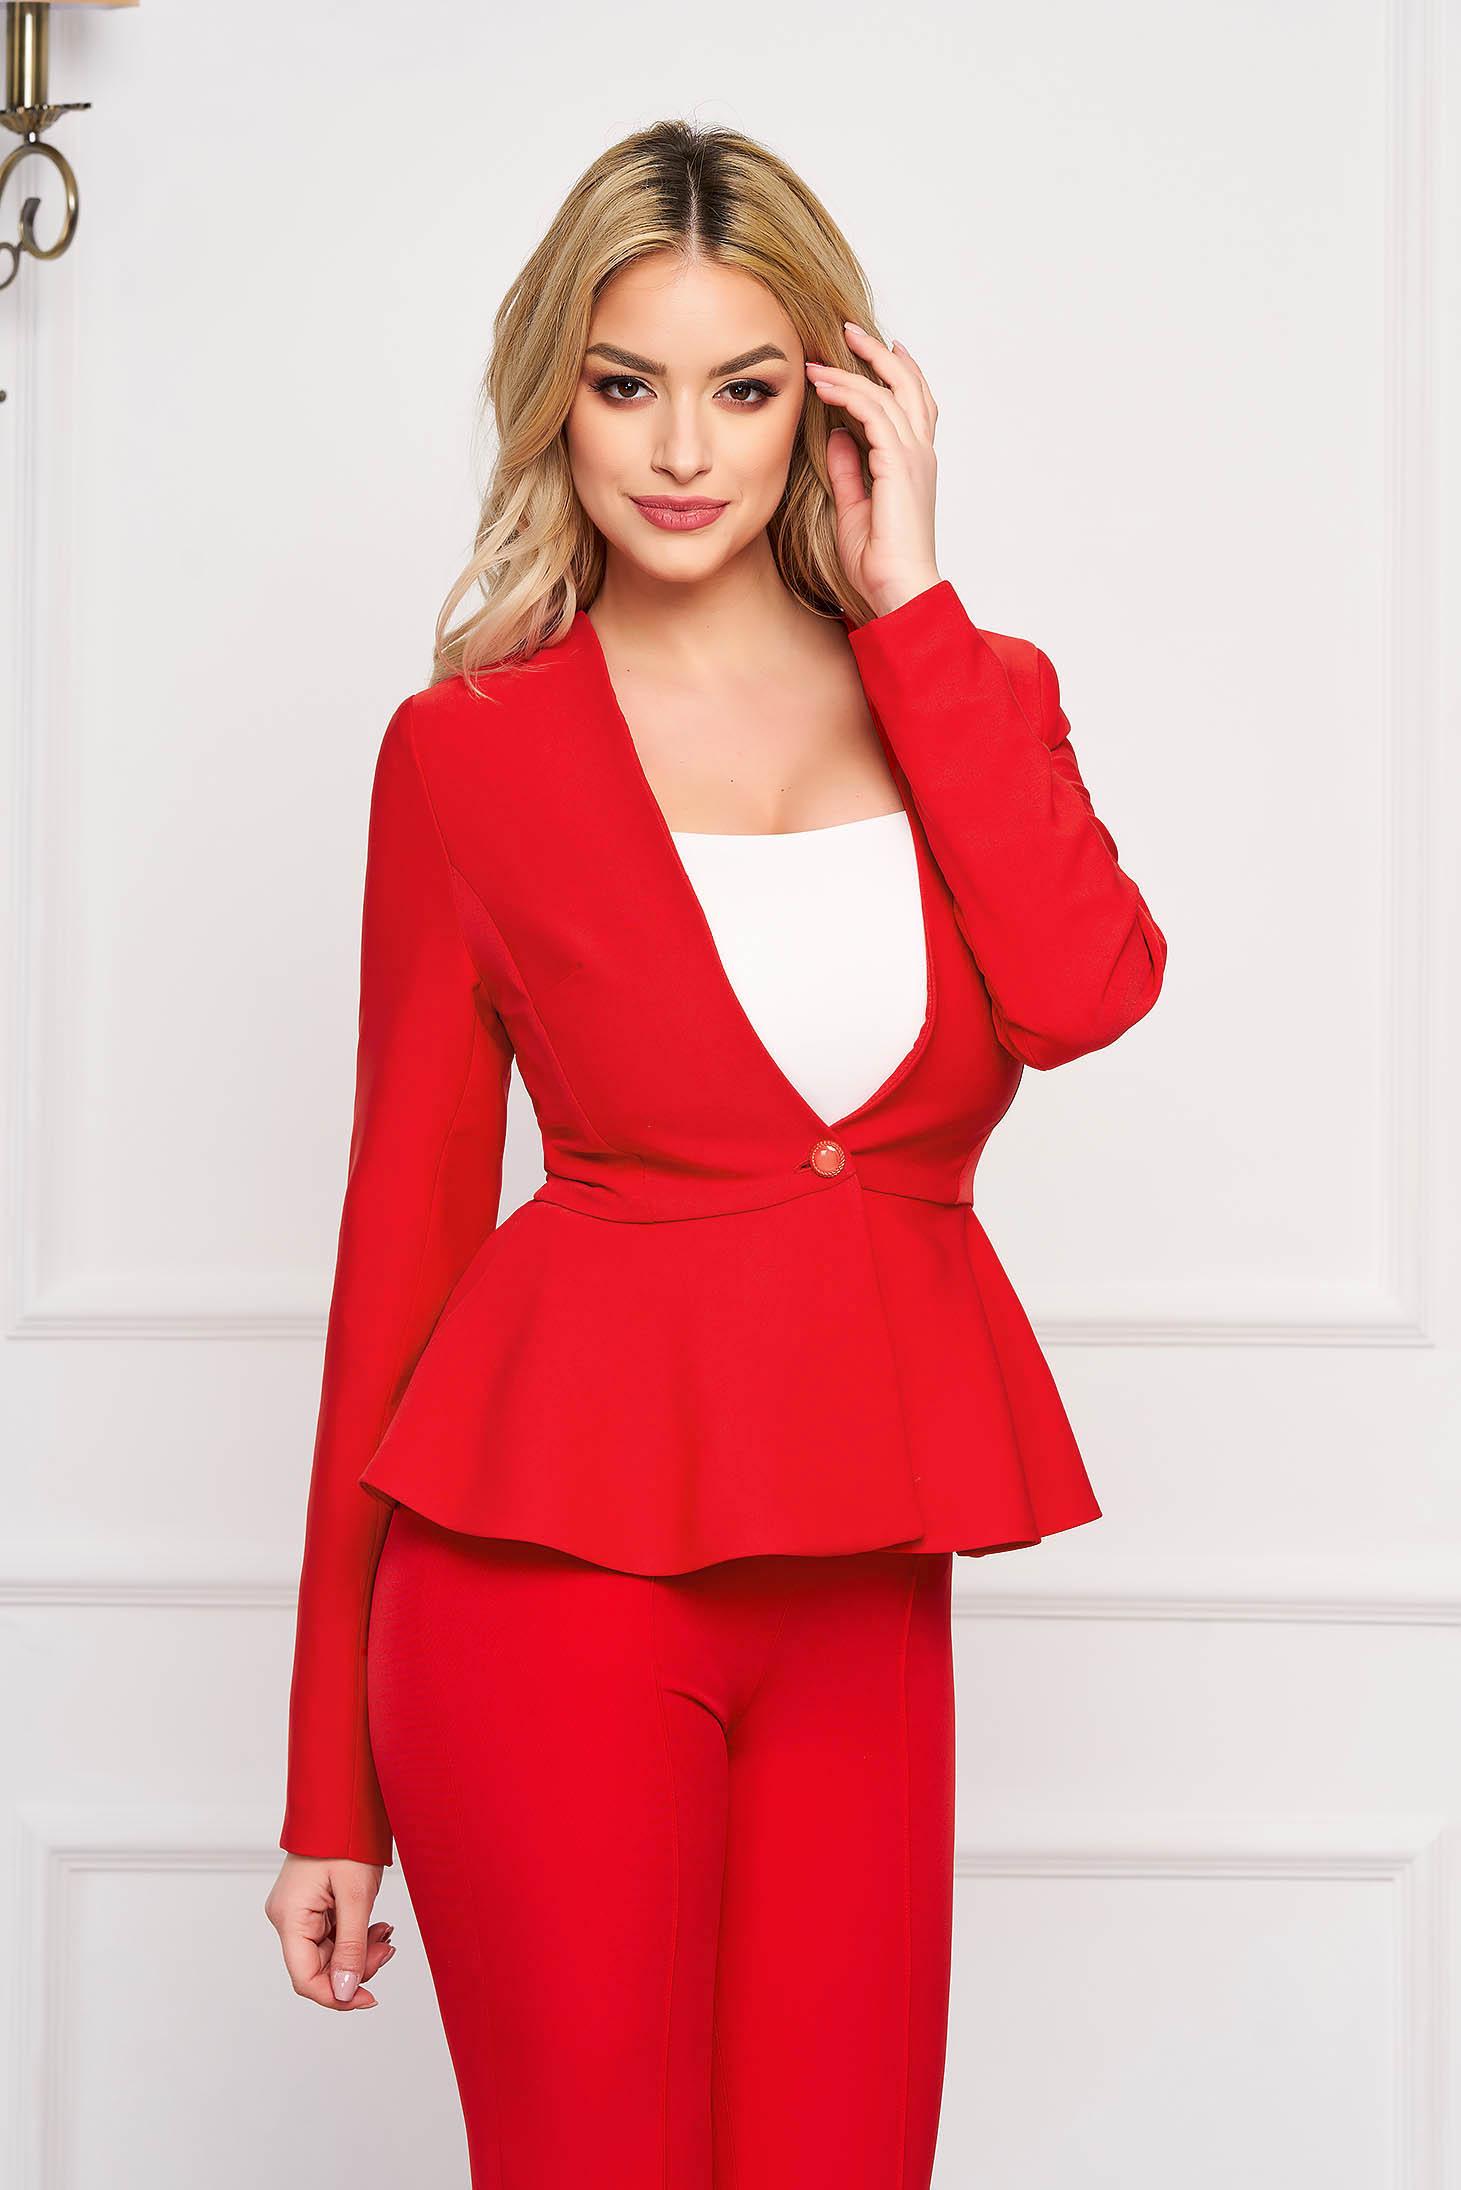 StarShinerS red jacket elegant short cut cloth slightly elastic fabric long sleeved with inside lining